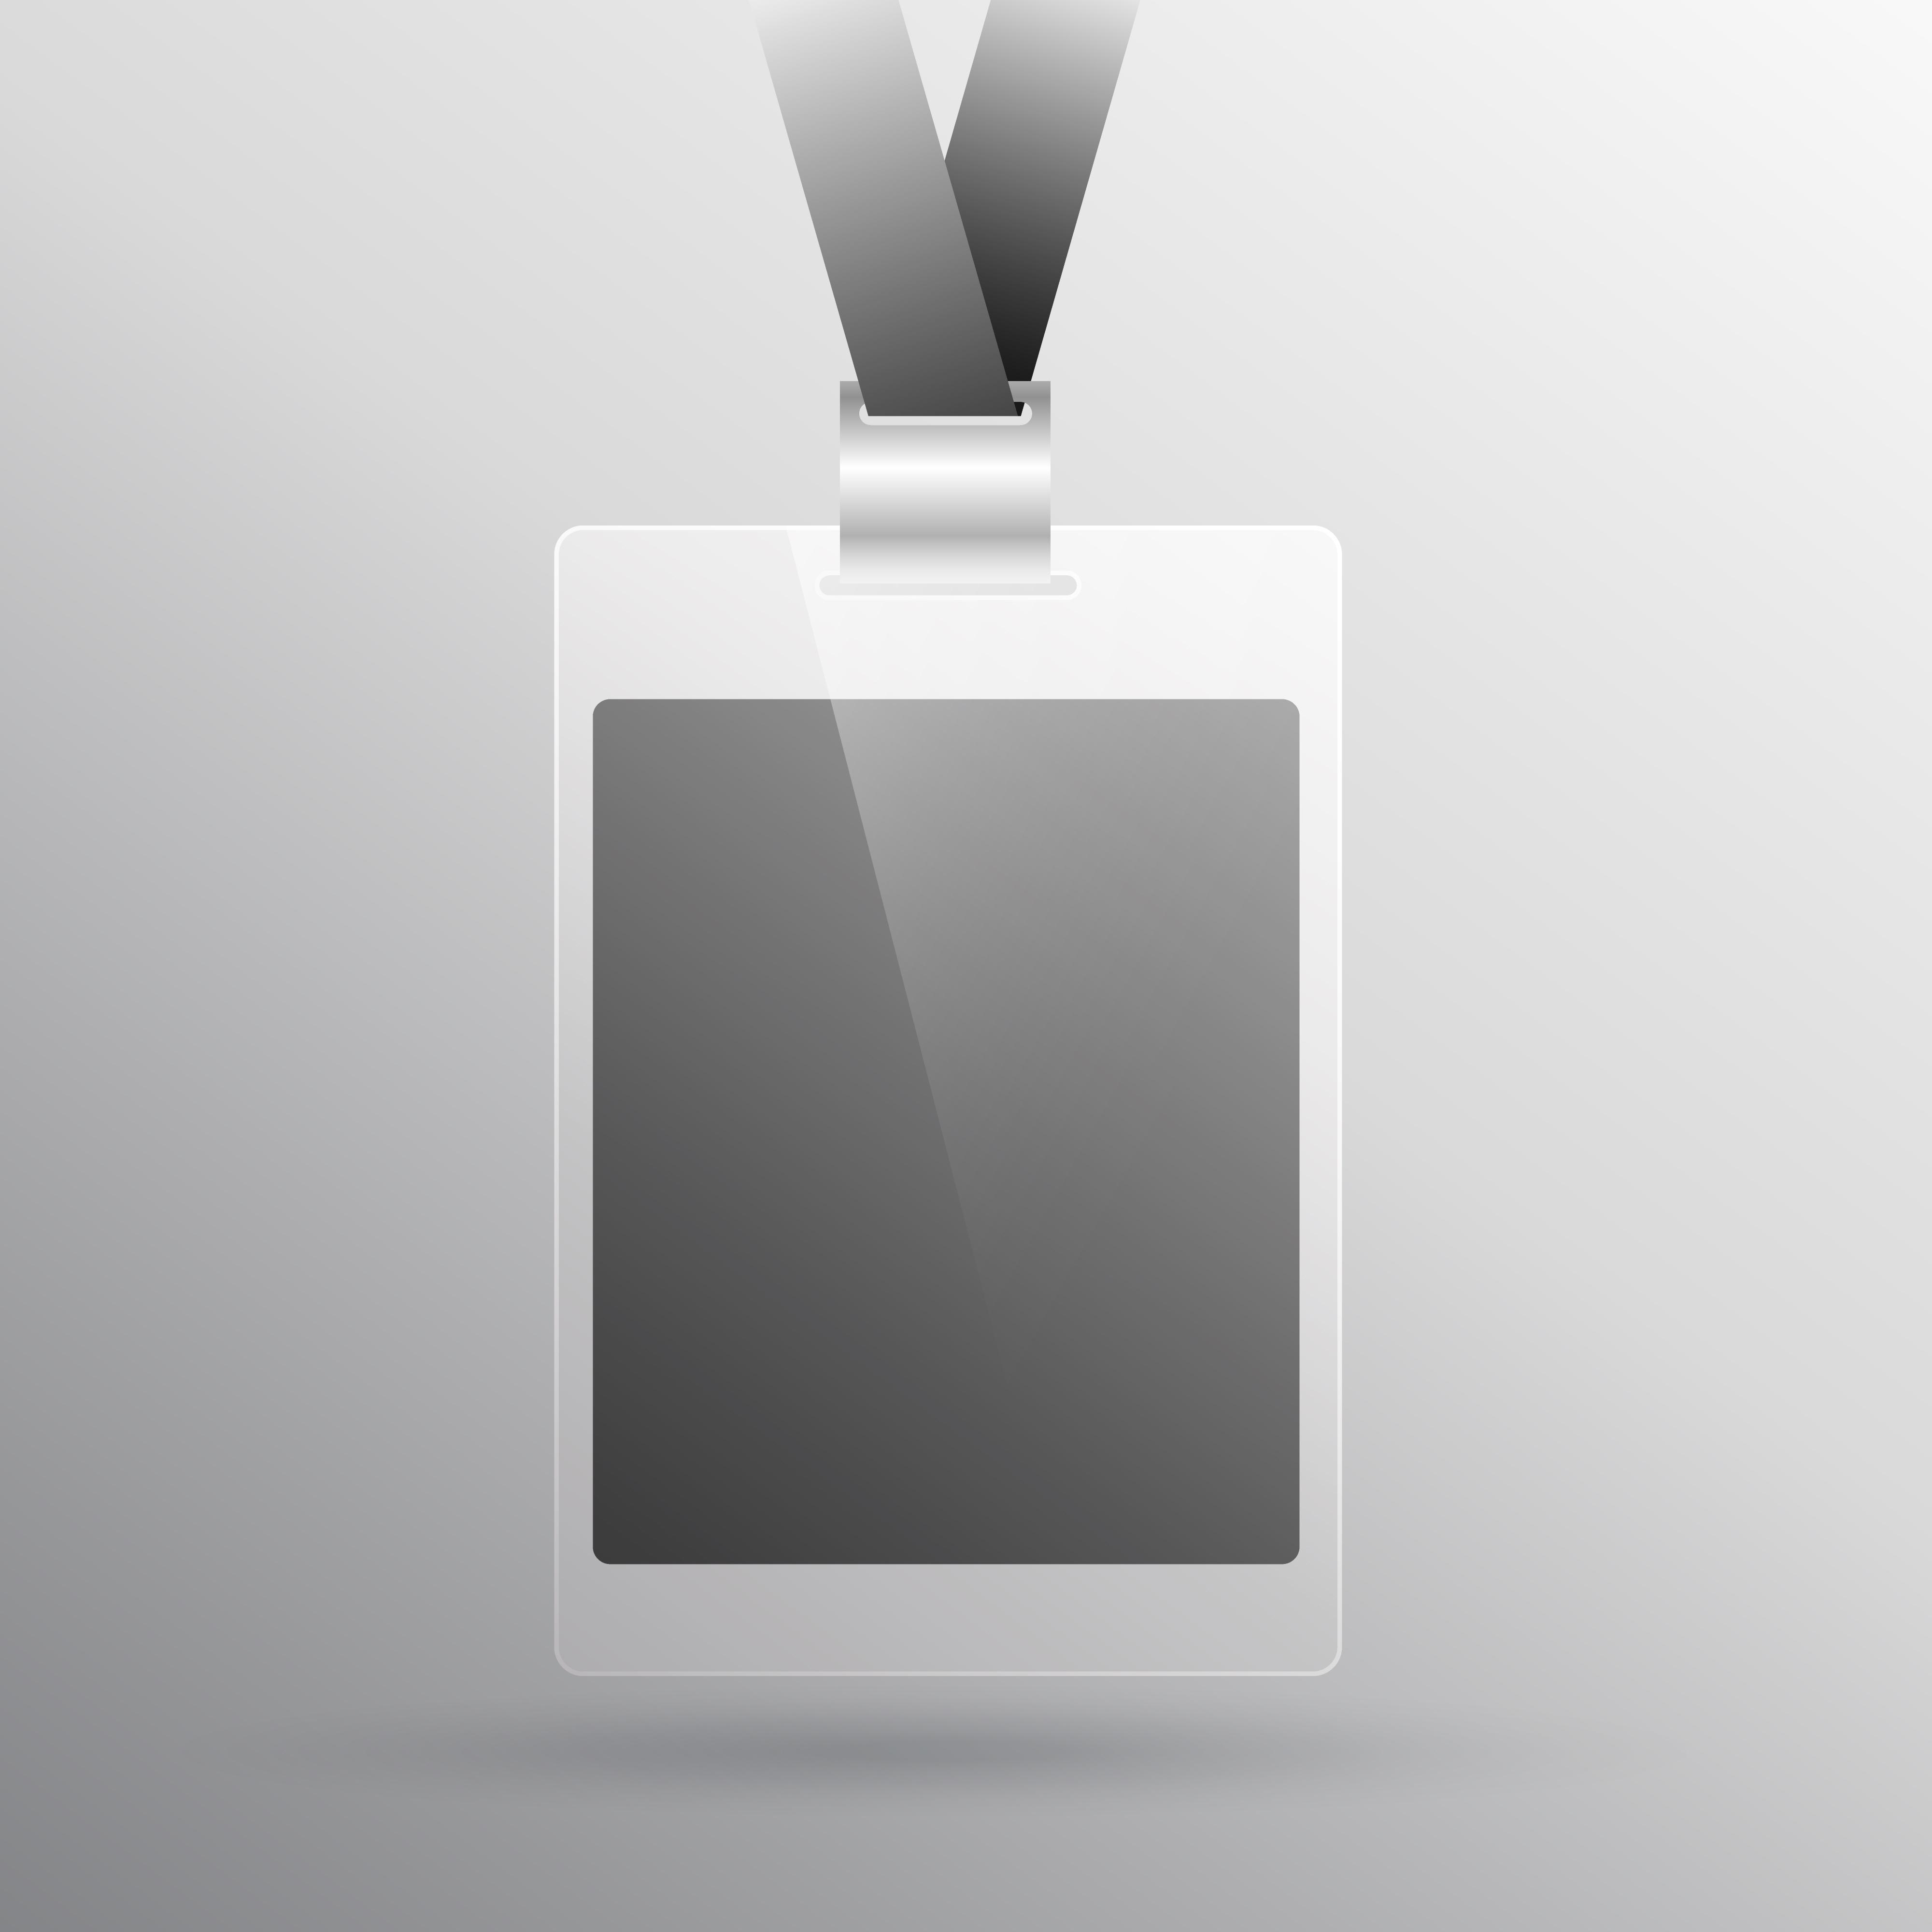 id tags free vector art